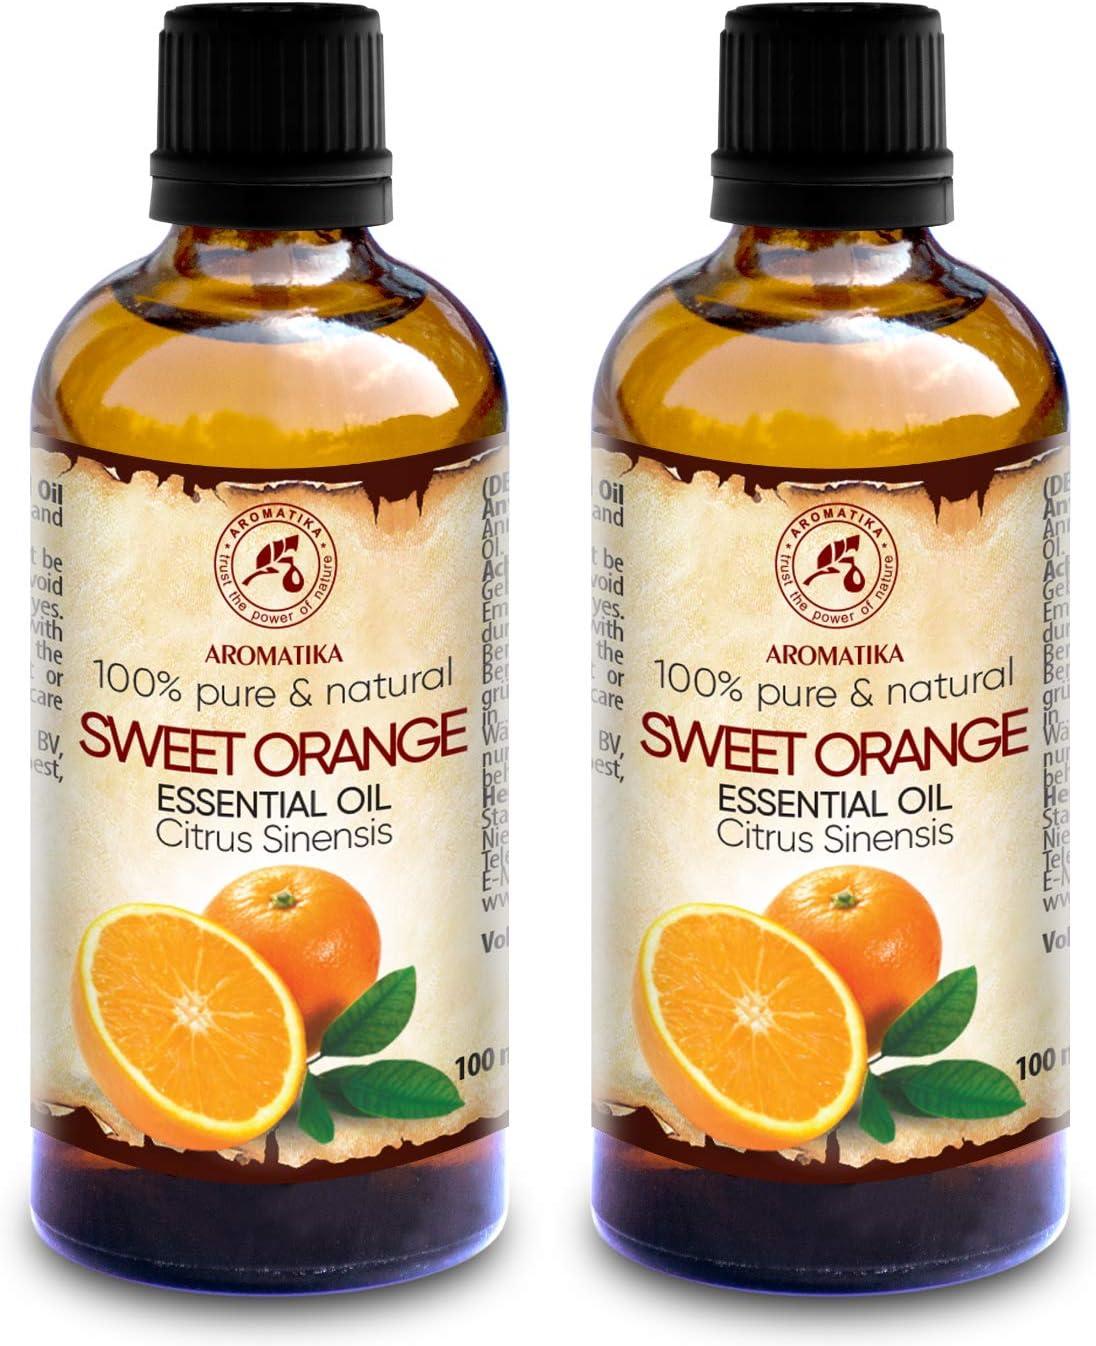 Aceite Esencial Naranja 200ml - 2x100ml - 100% Puro & Natural - Brasil - Efecto Contra la Celulitis - Mejor para Belleza - Aromaterapia - Masaje - Baño - Difusor - para un Buen Sueño